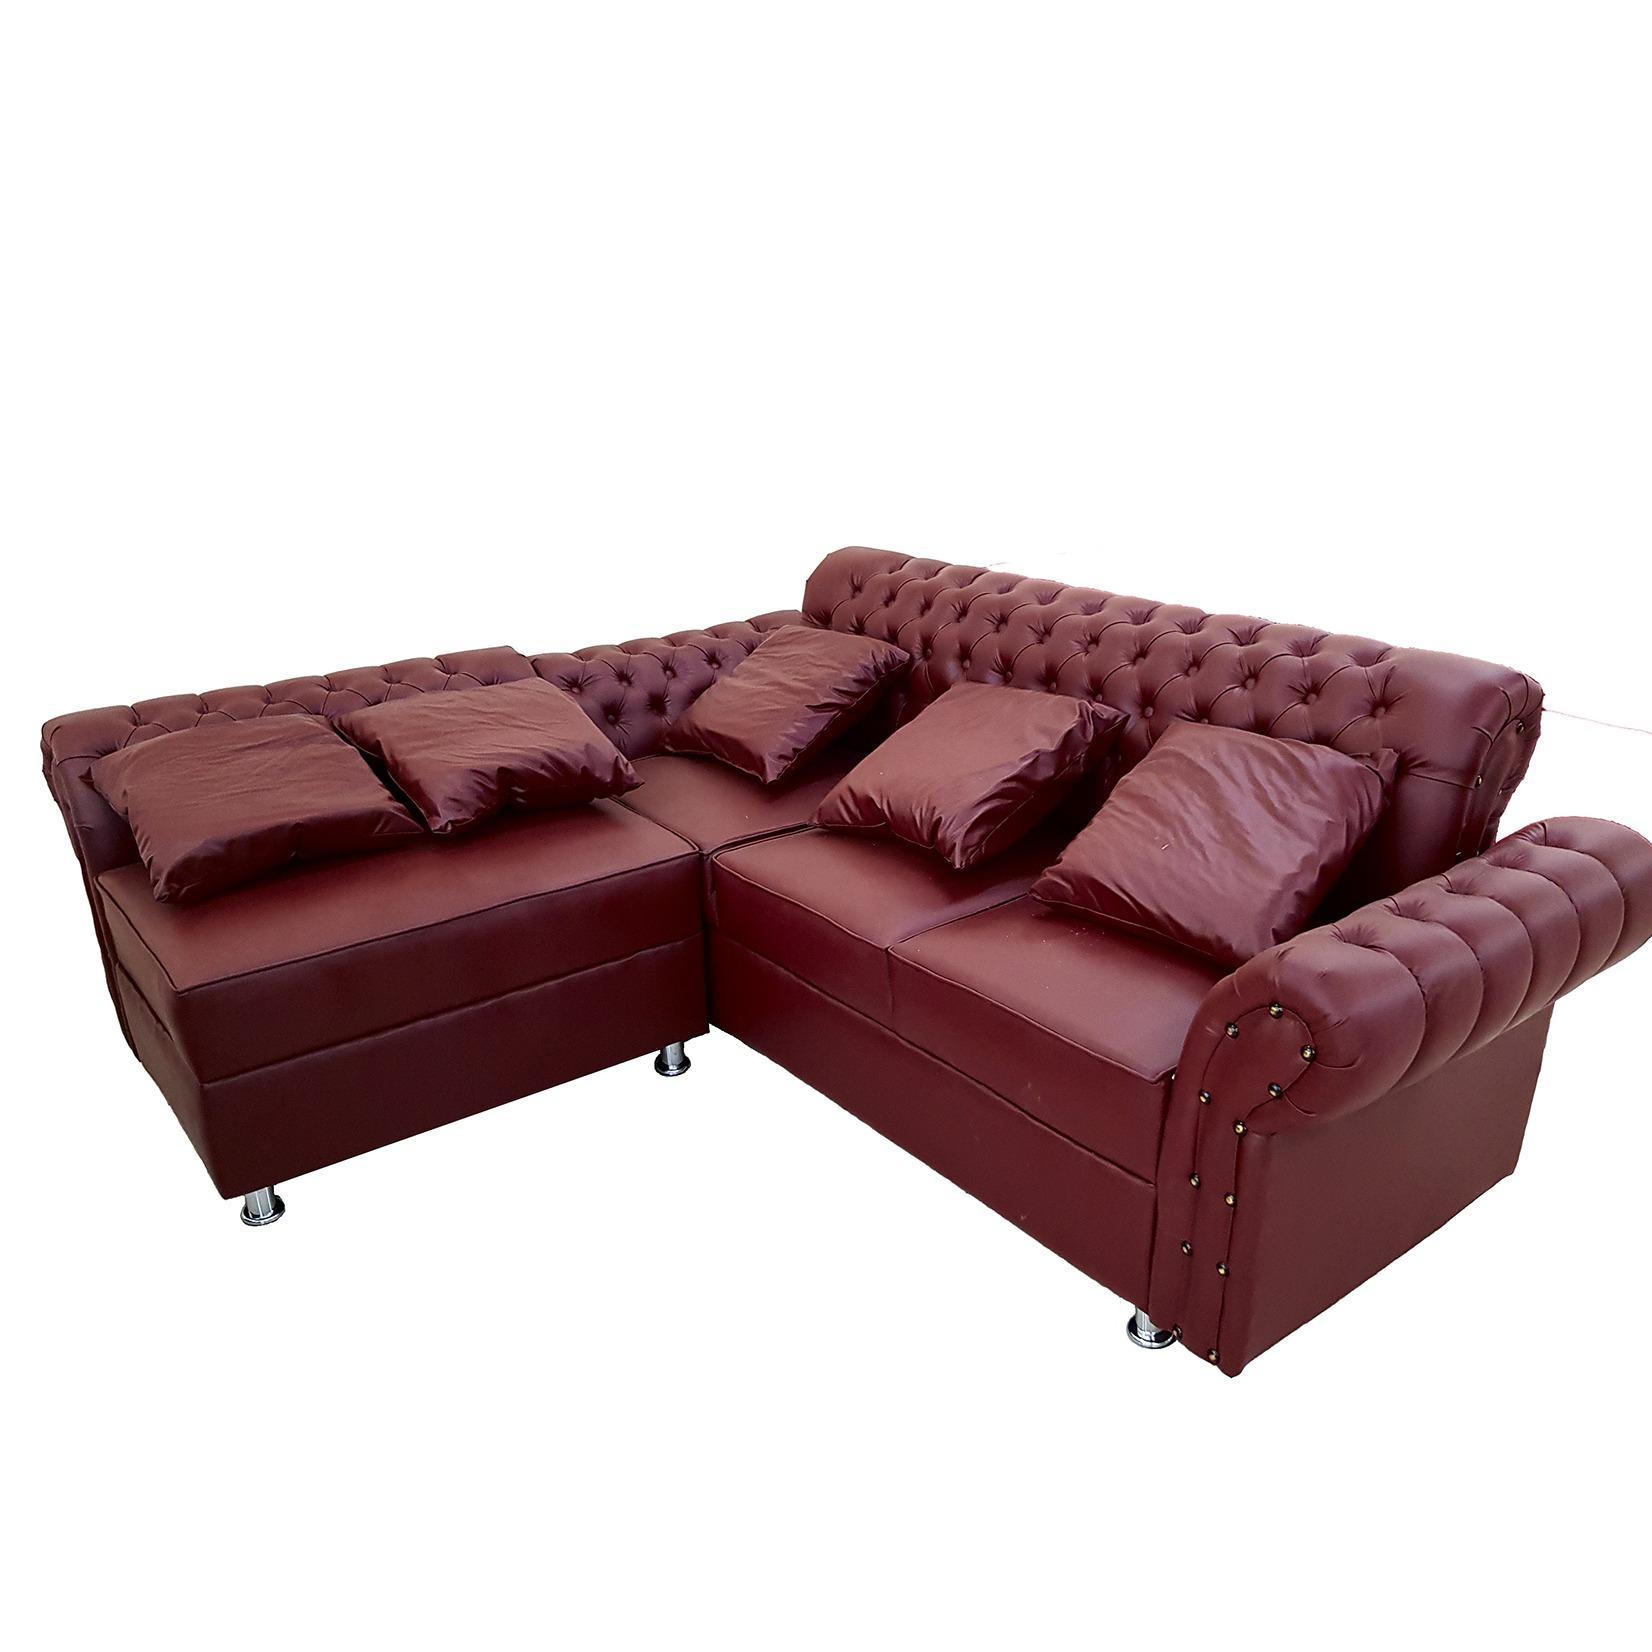 Simpati Sofa Minimalis Modern L Xenia Jabodetabek Daftar Harga Abee Unik Rumah Hotel Bed Bantal Custom Kancing Seribu Free Ongkir